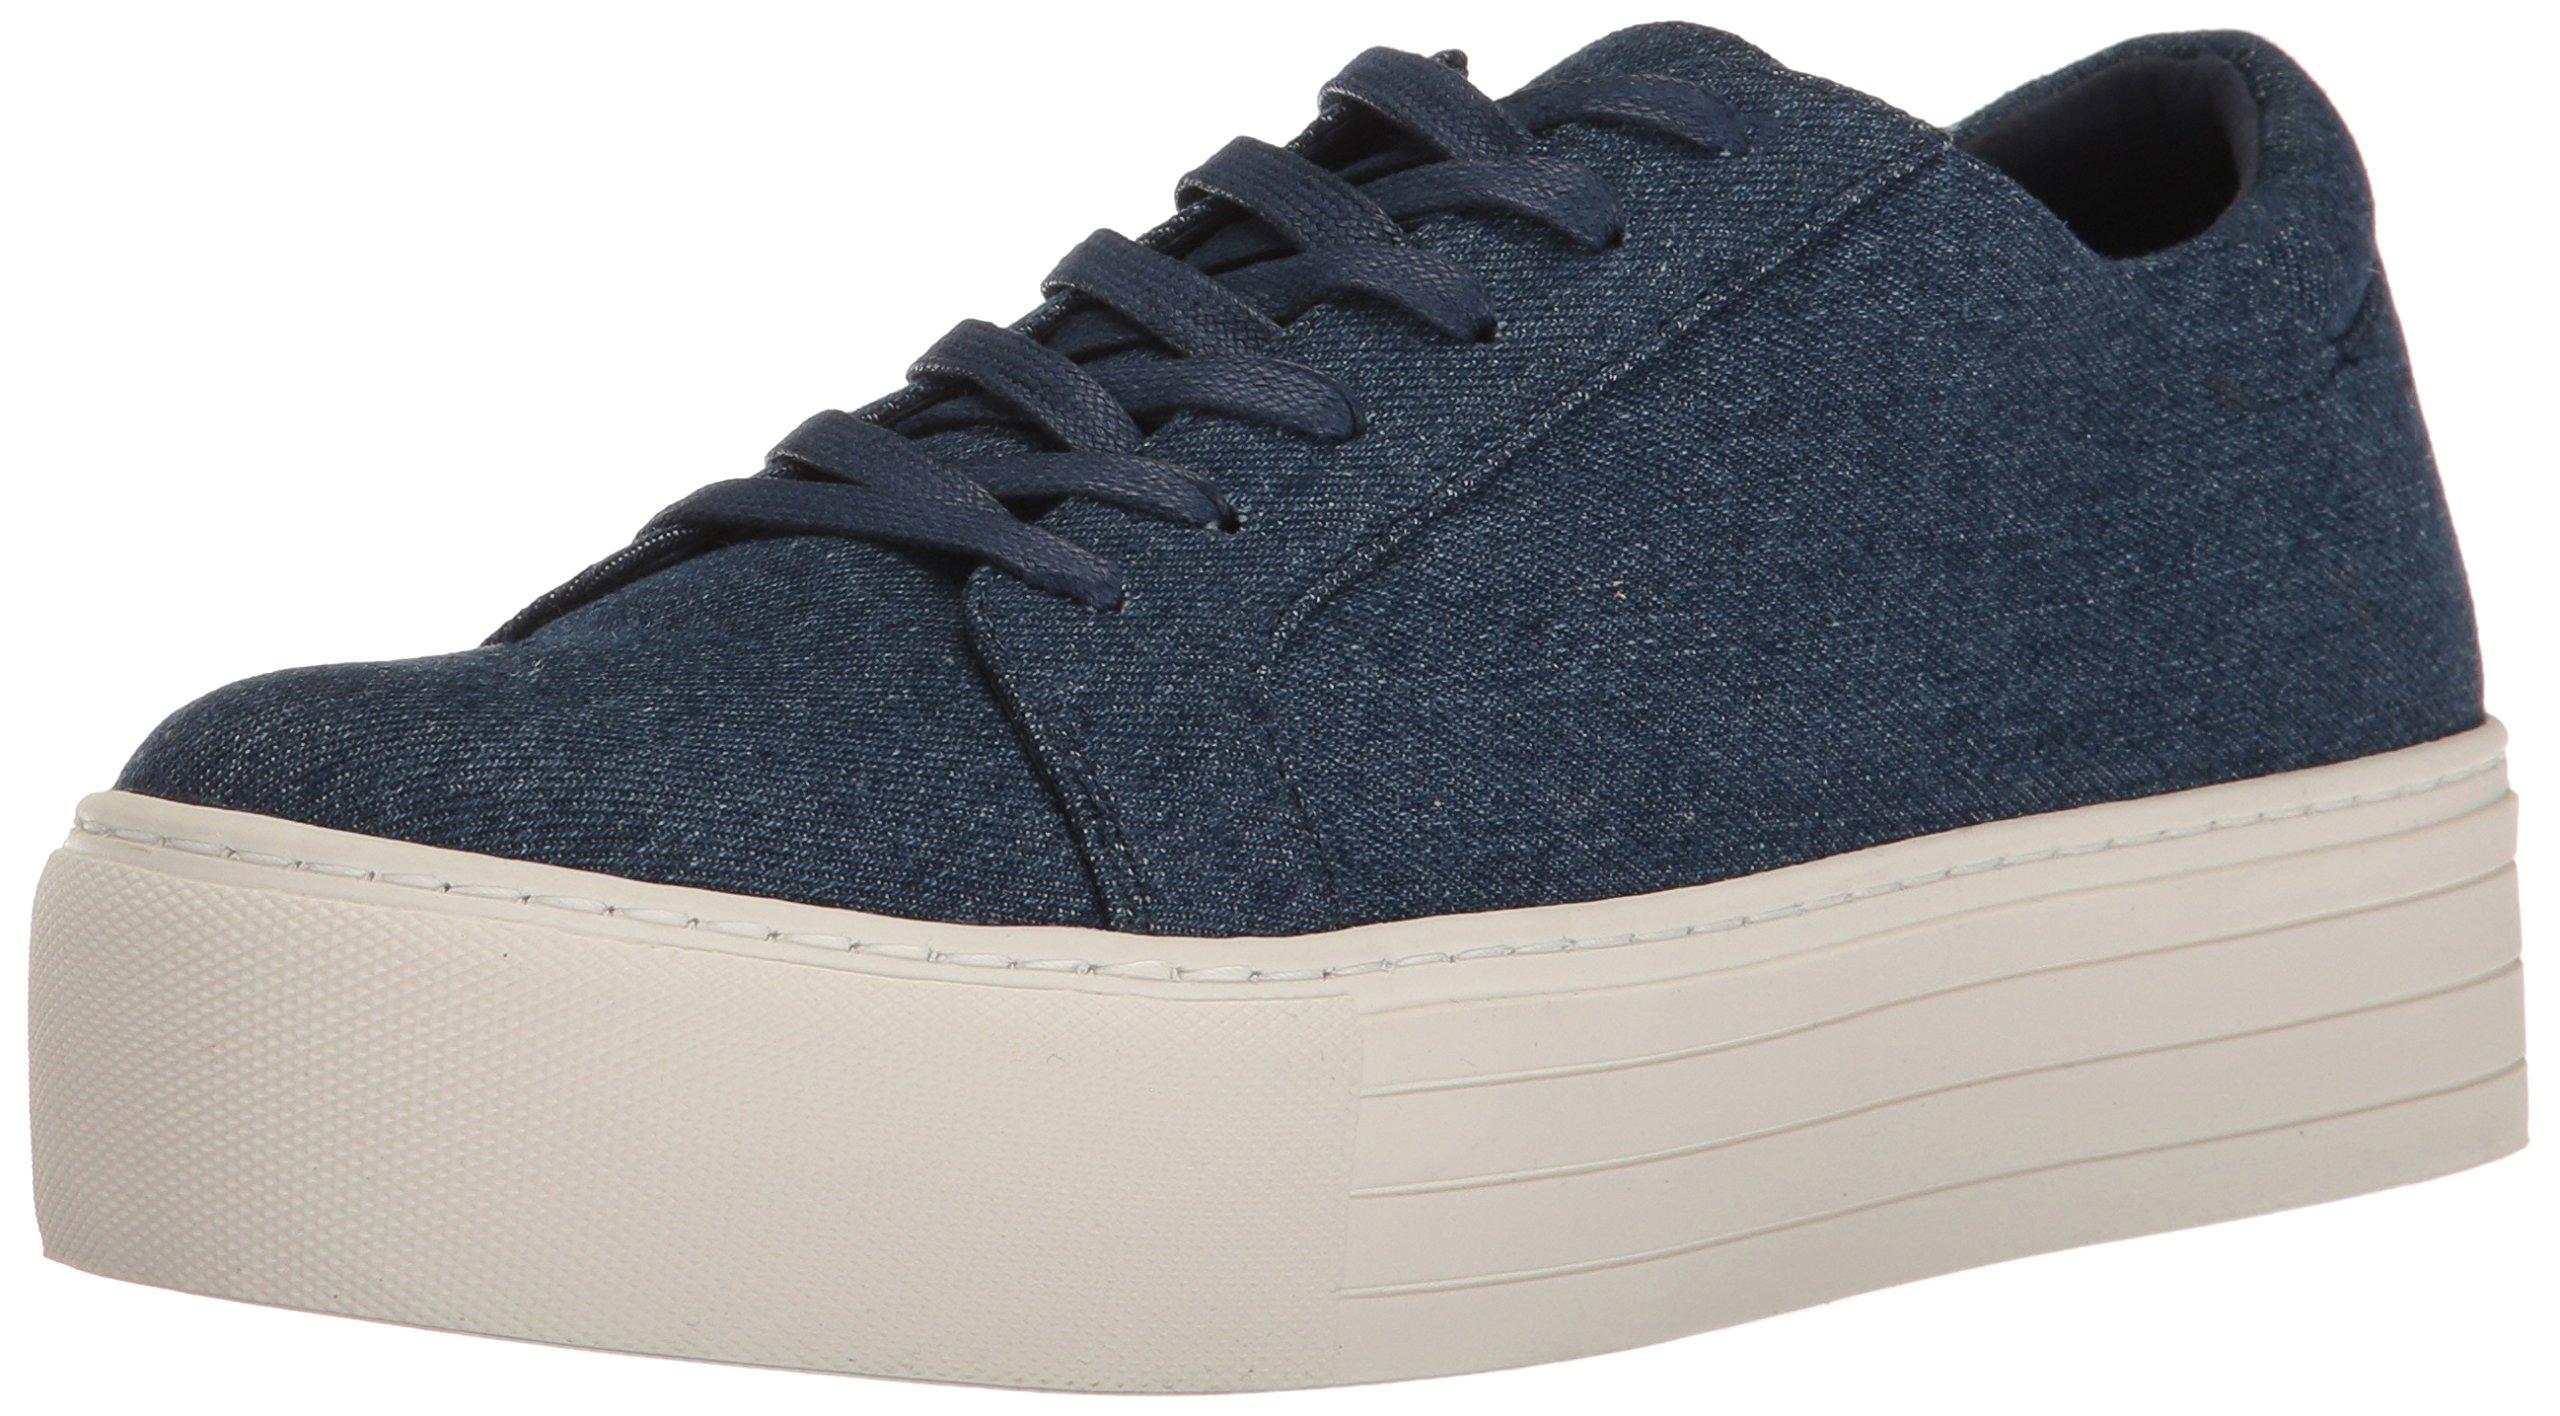 Kenneth Cole New York Women's Abbey Fashion Sneaker, Blue, 7.5 M US